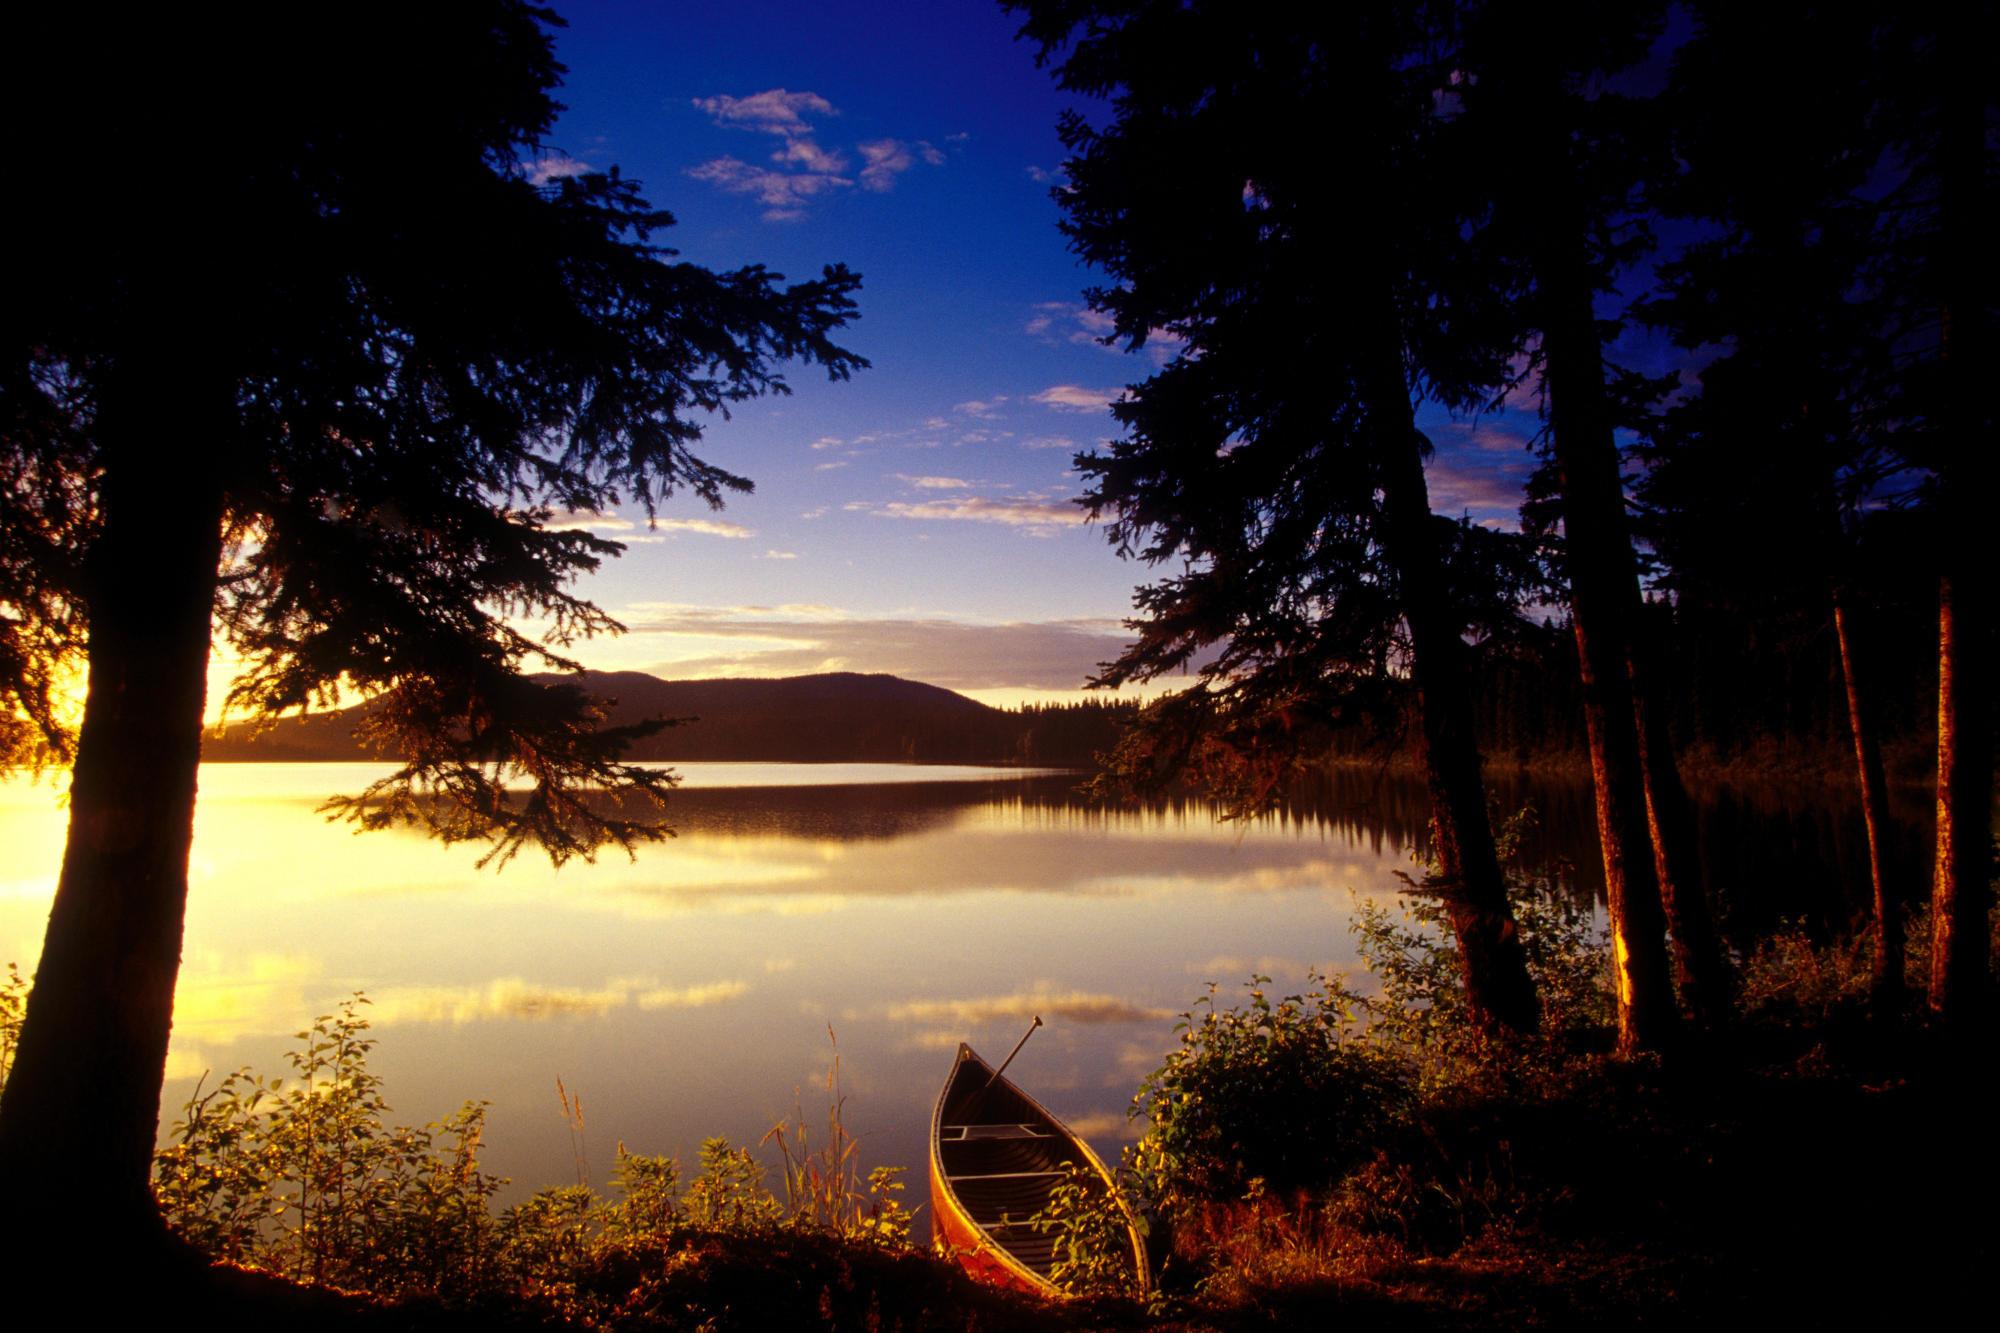 озеро в лесу на закате  № 380184  скачать